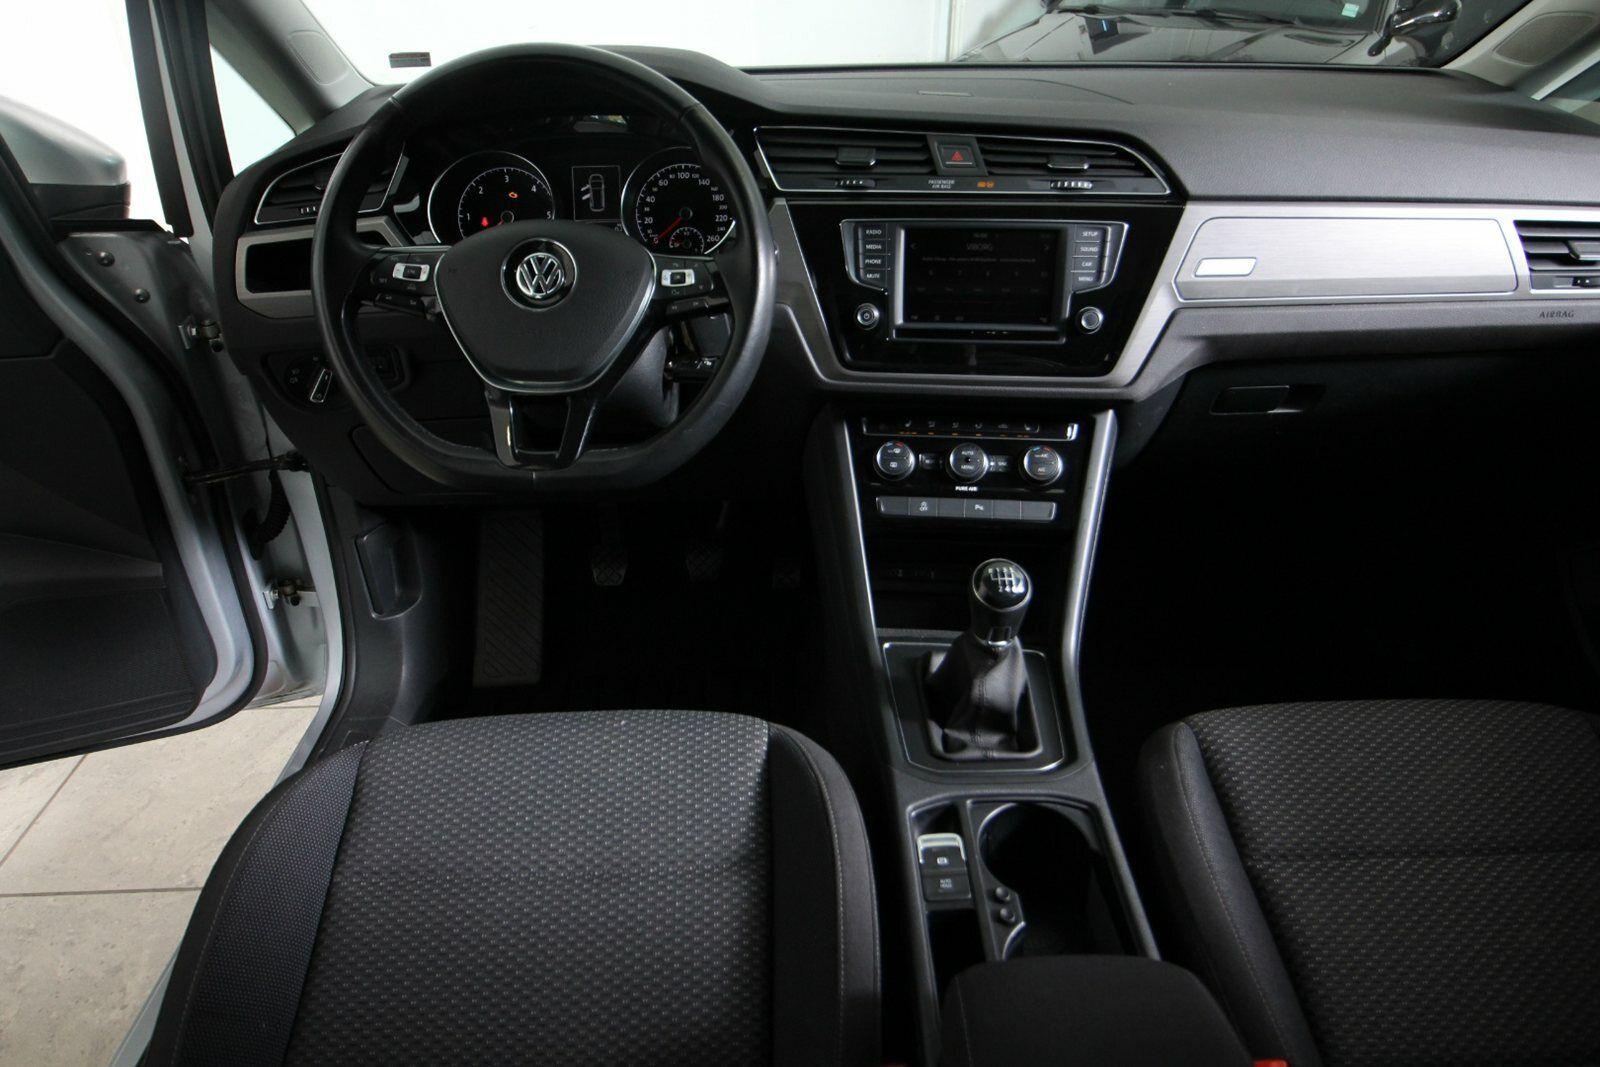 VW Touran TDi 150 Comfortline BMT